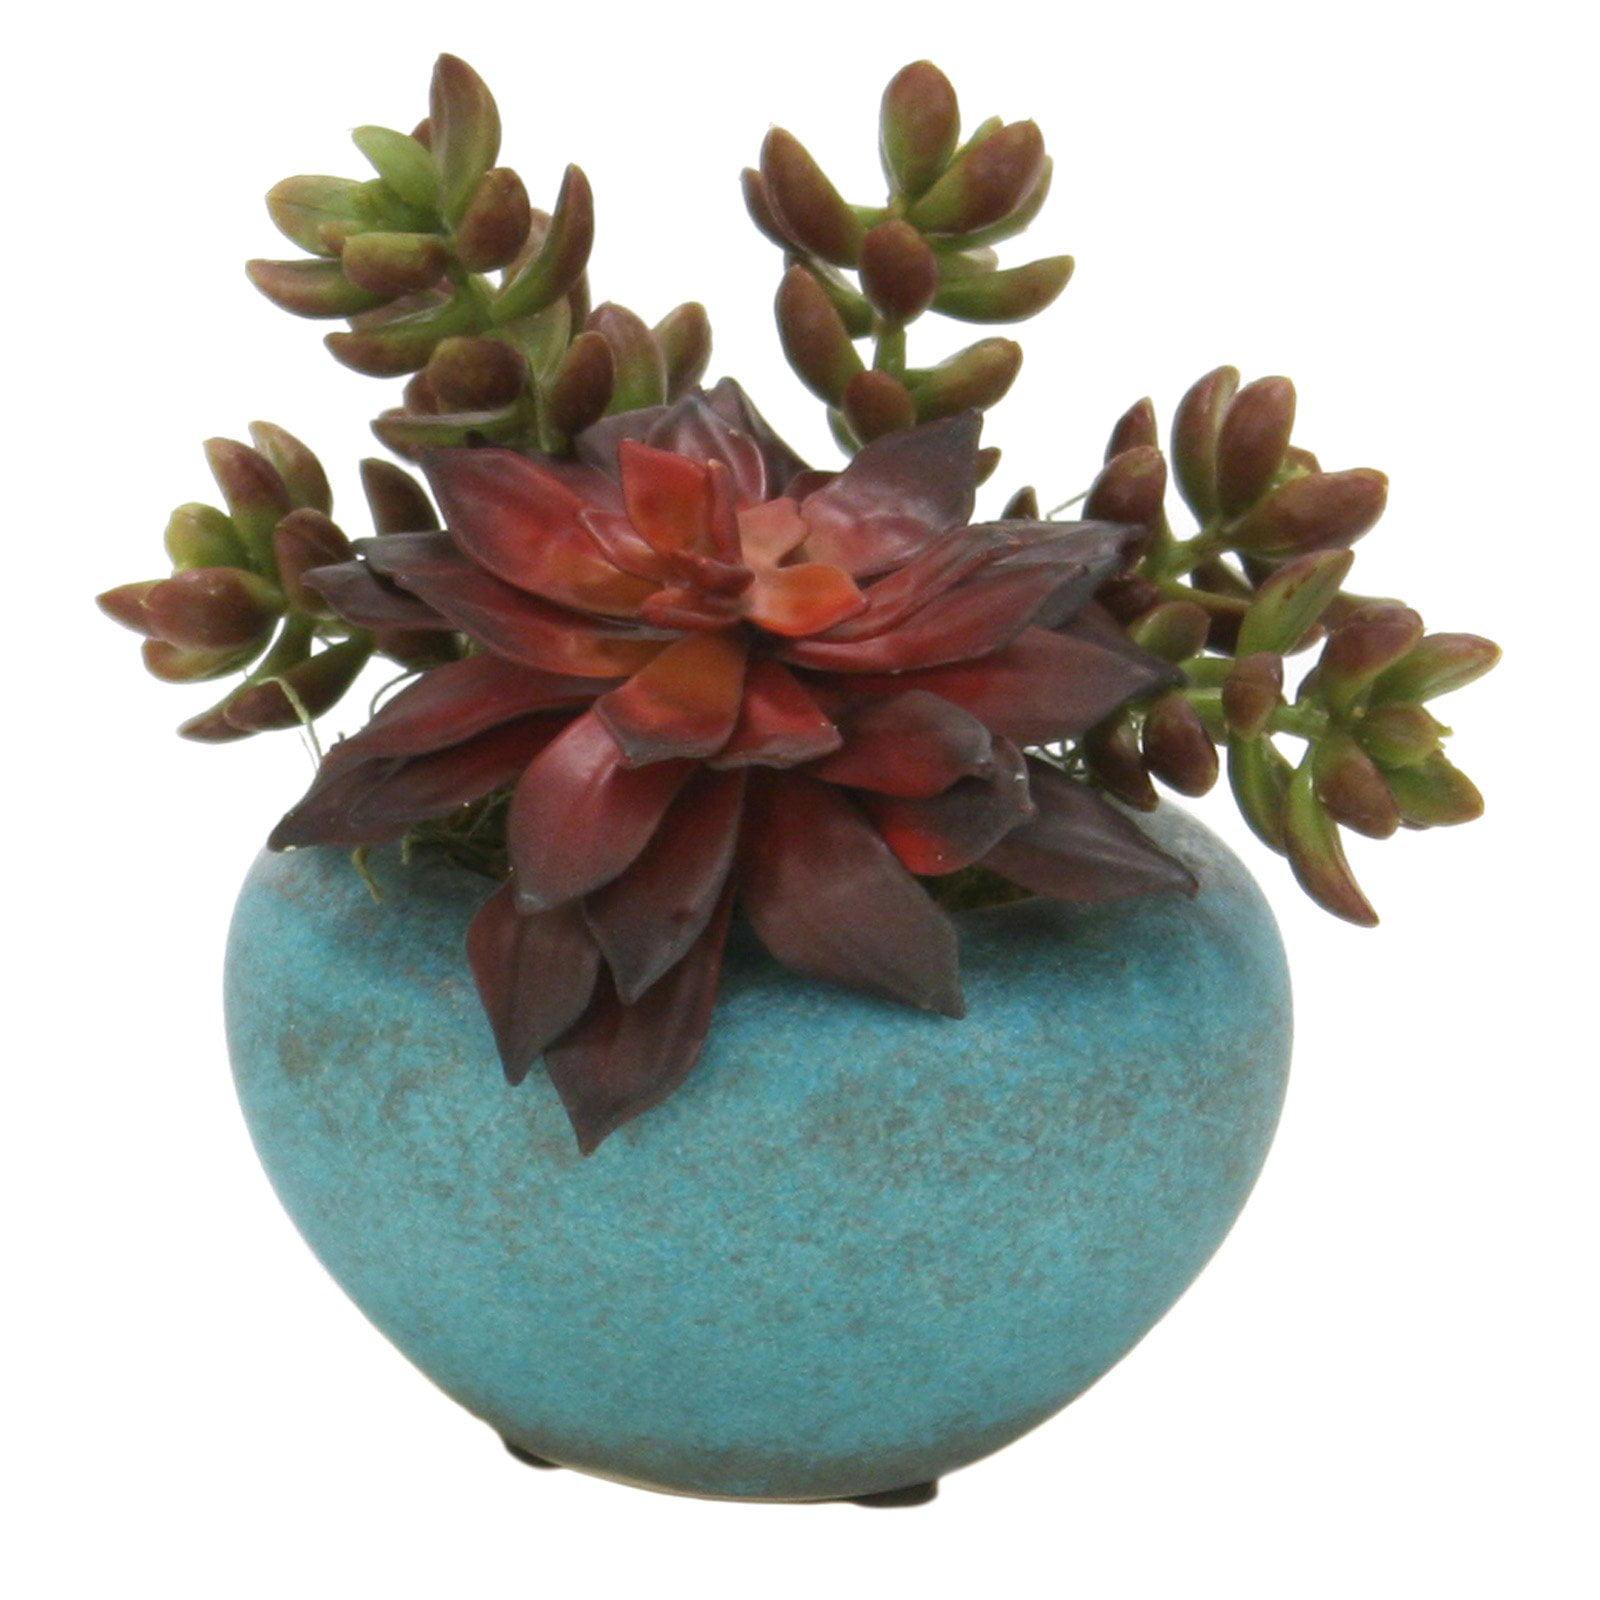 Distinctive Designs Mixed Succulents Silk Plant in Pots - Set of 3